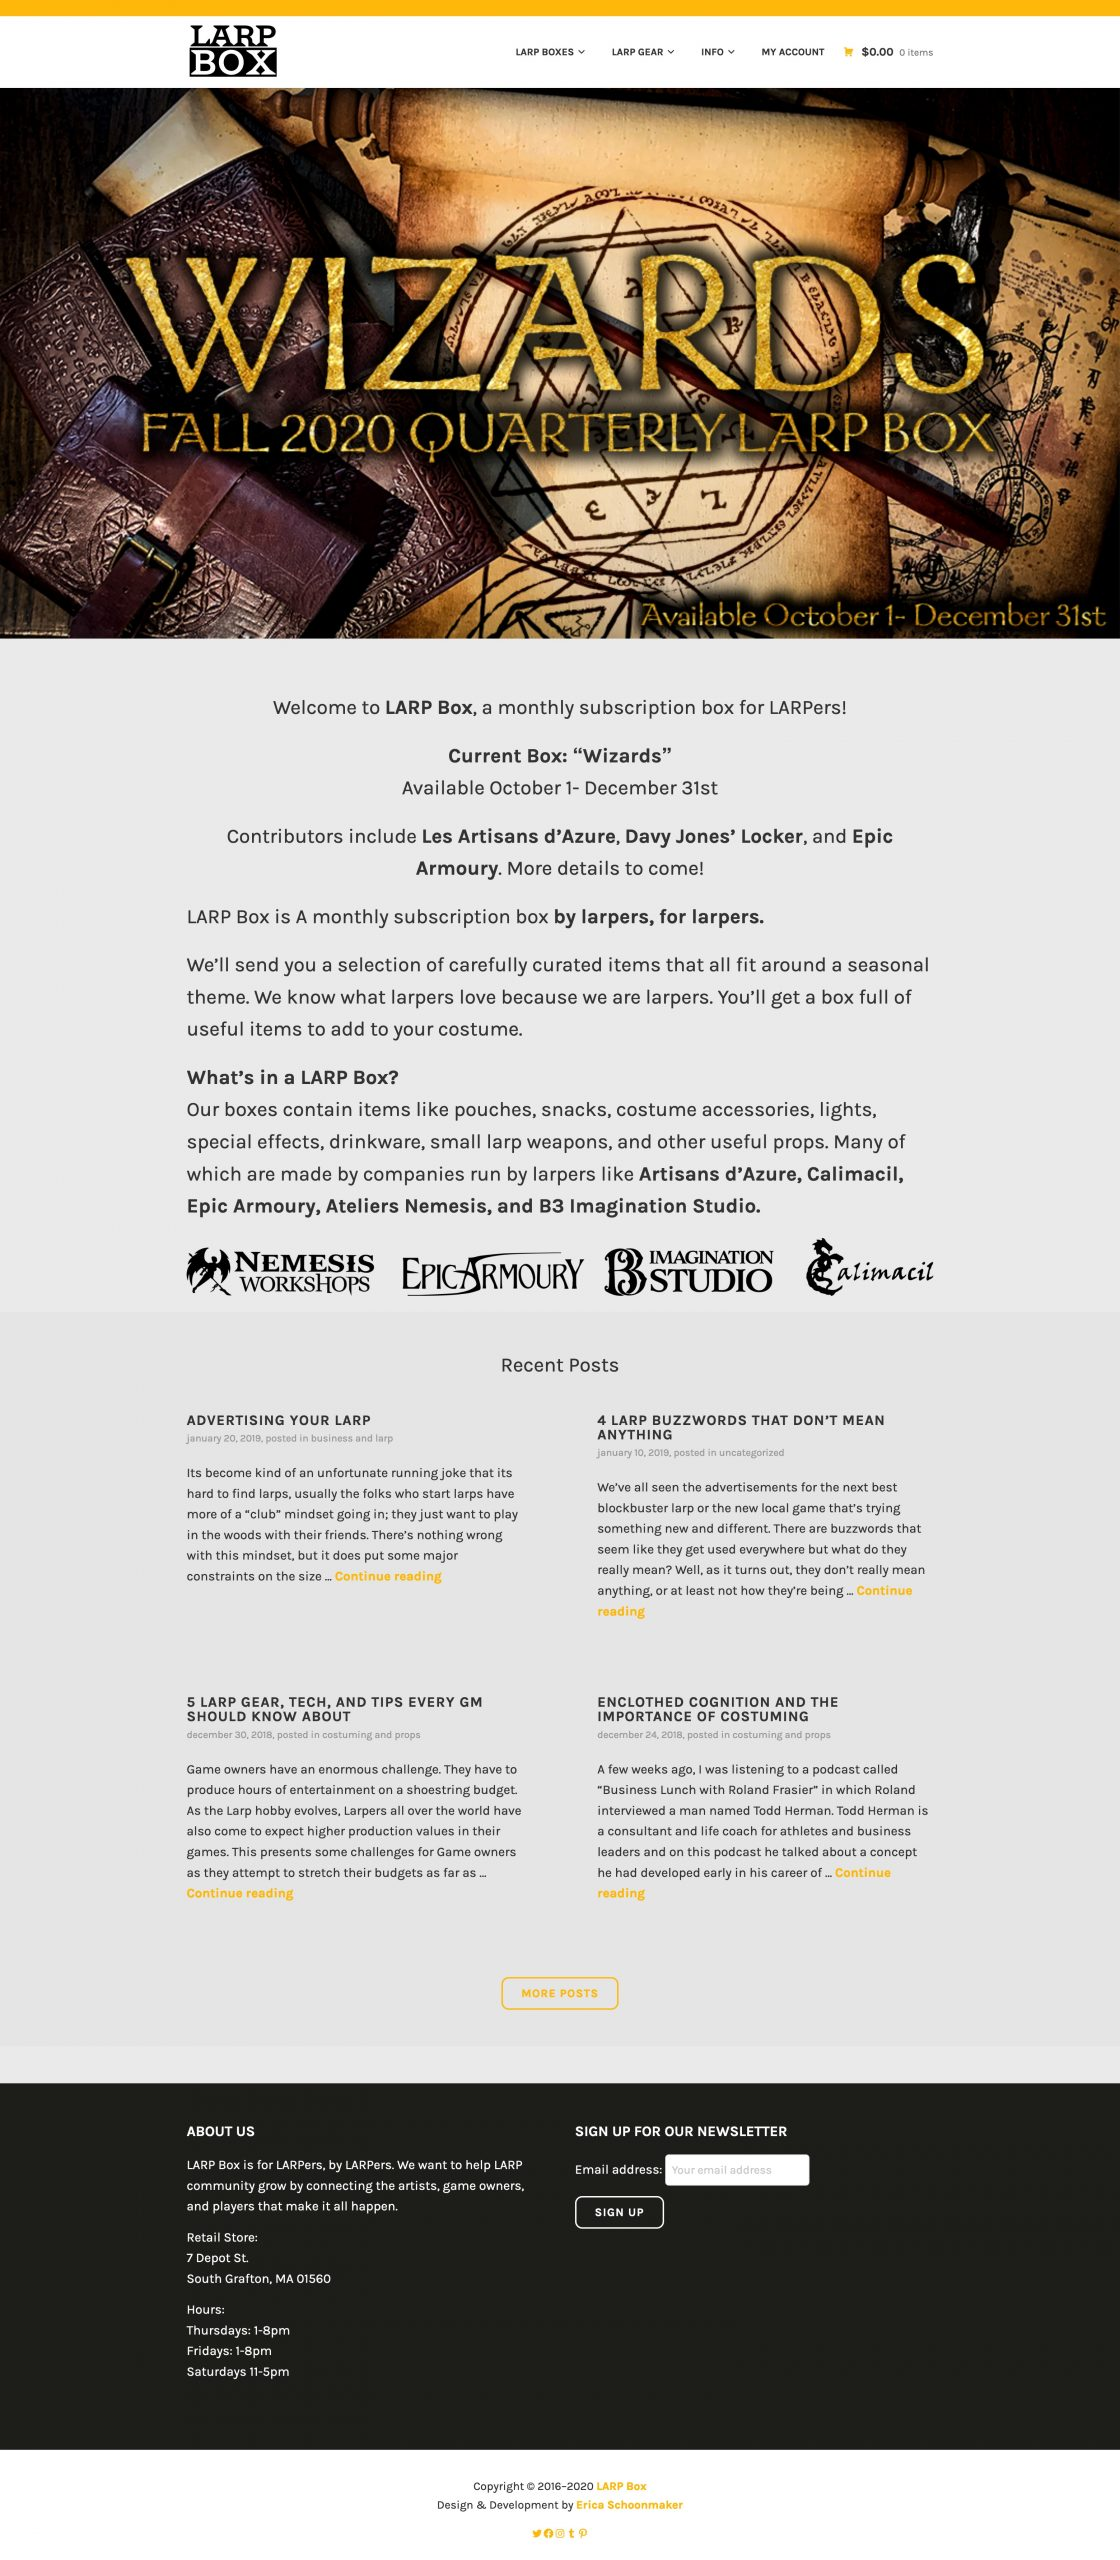 LARP Box Website